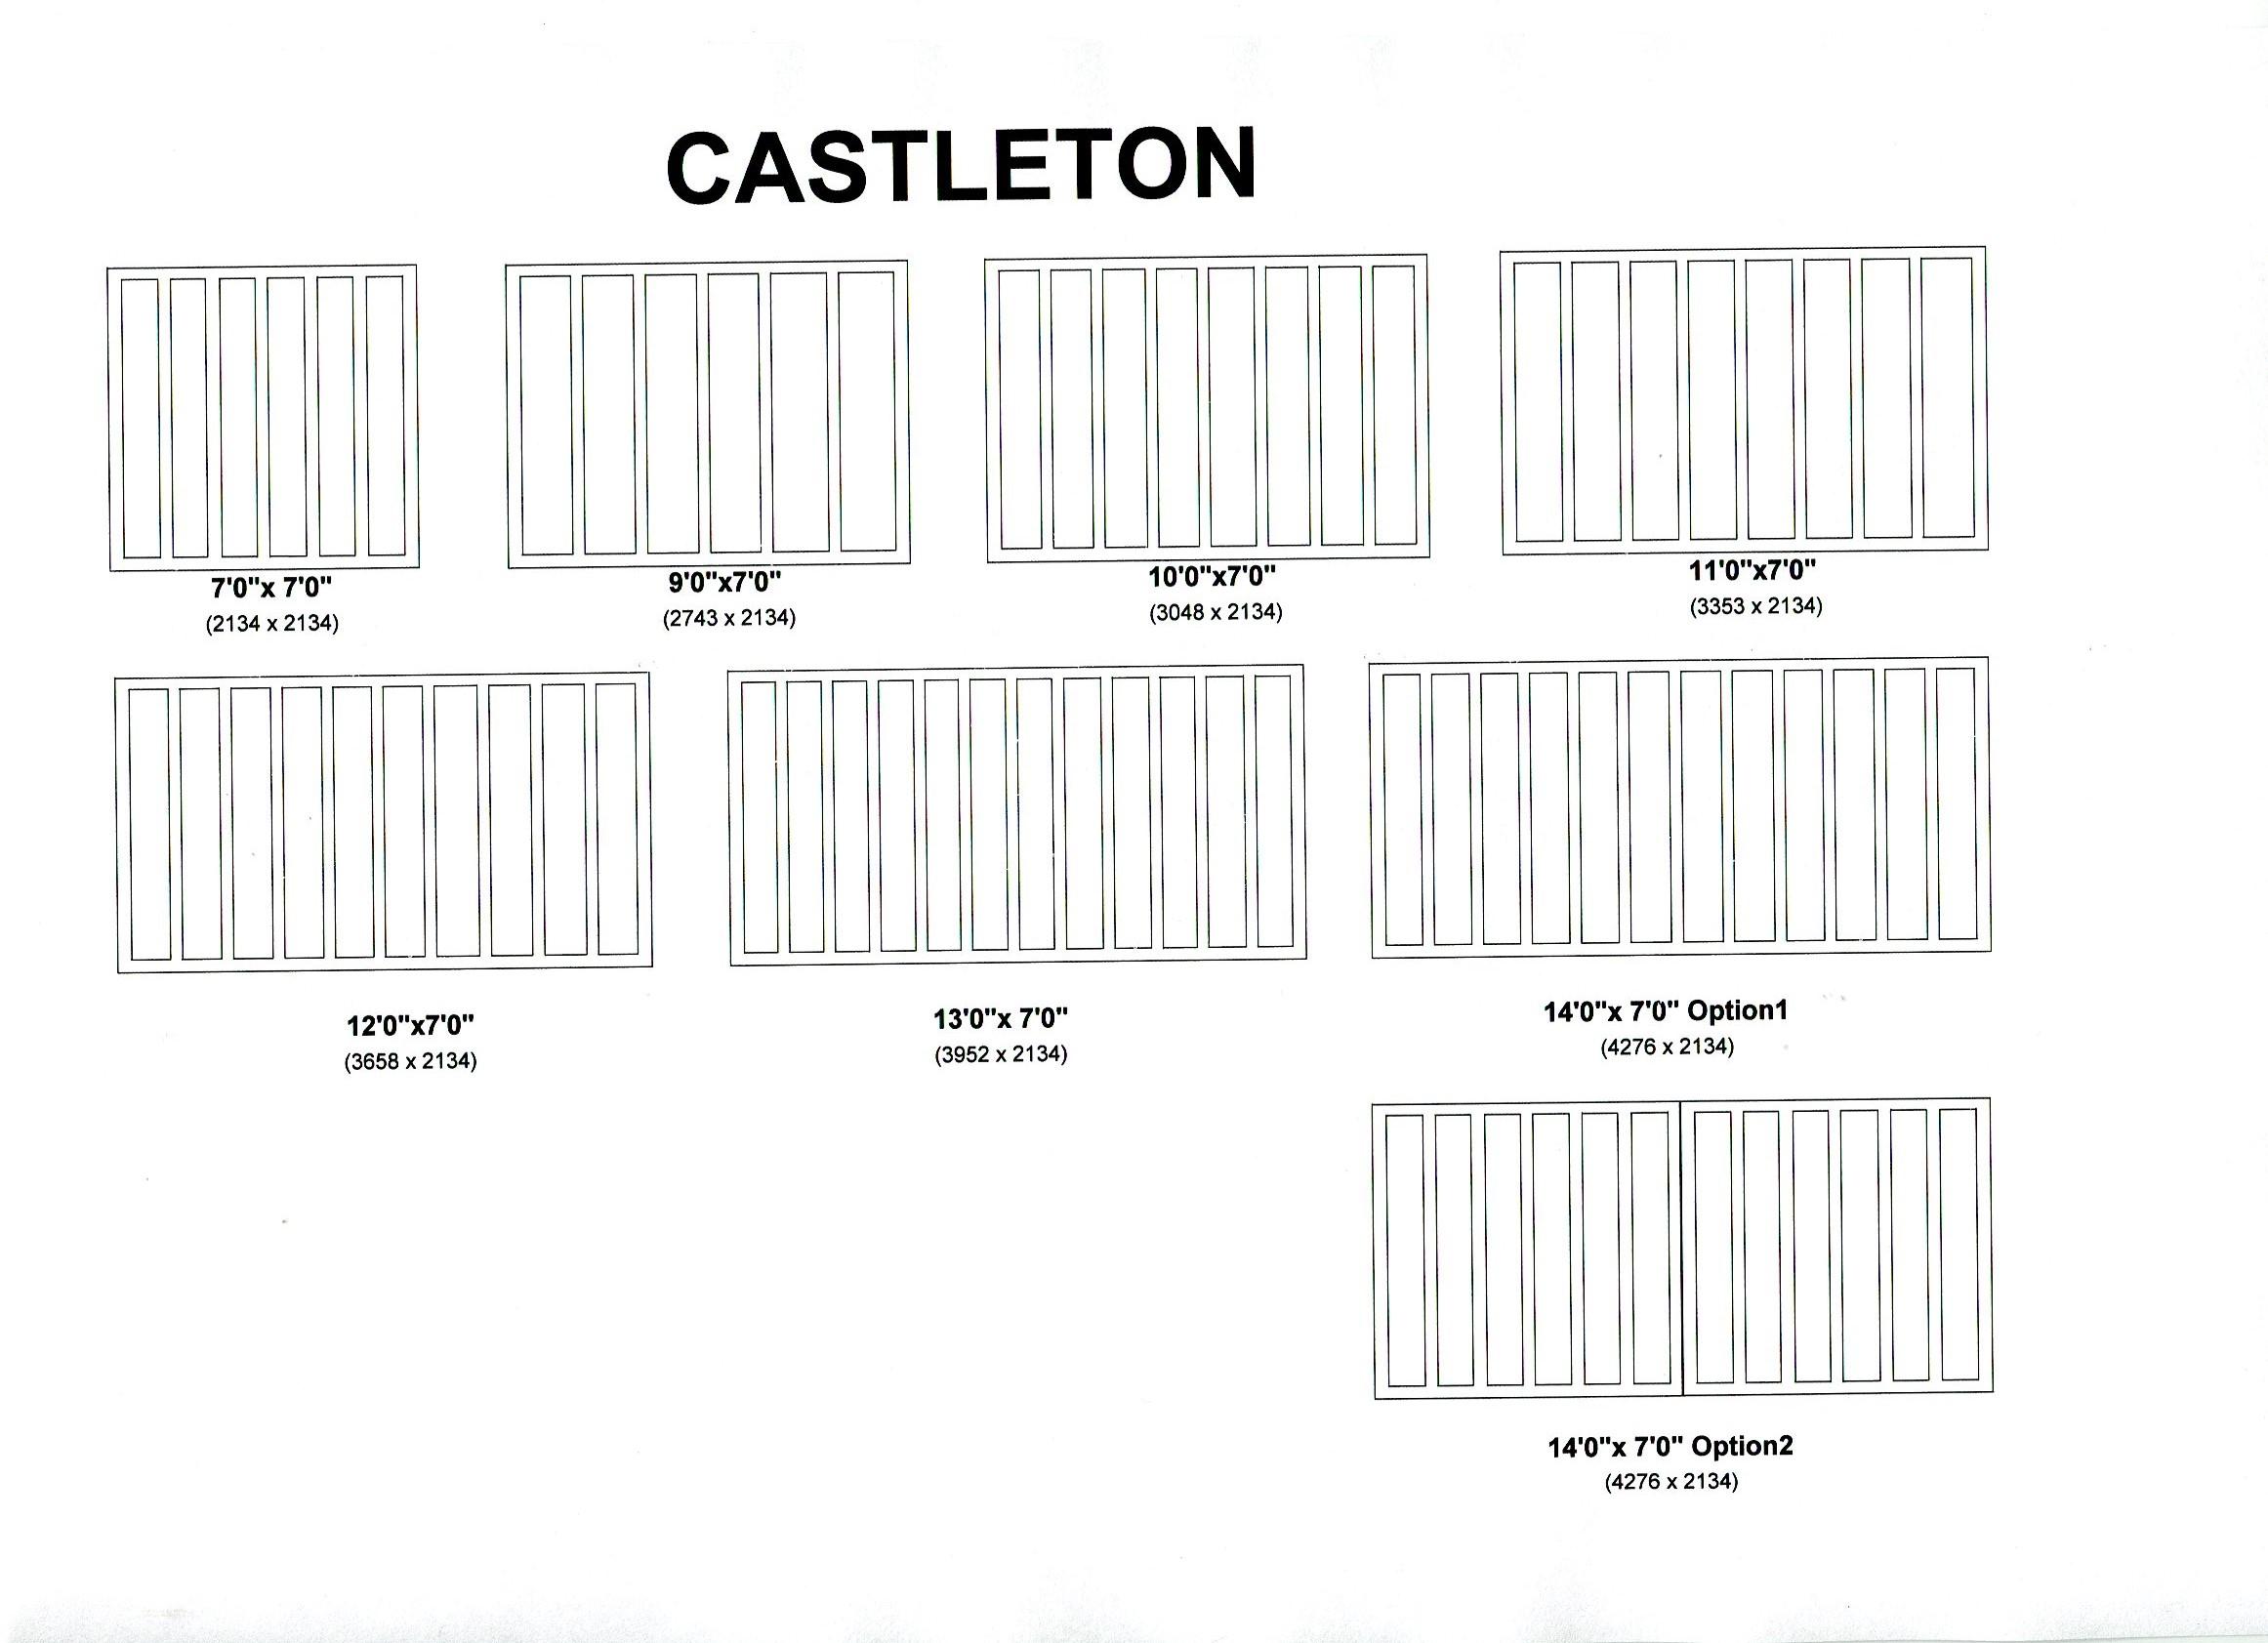 Cedar Door Castleton design options